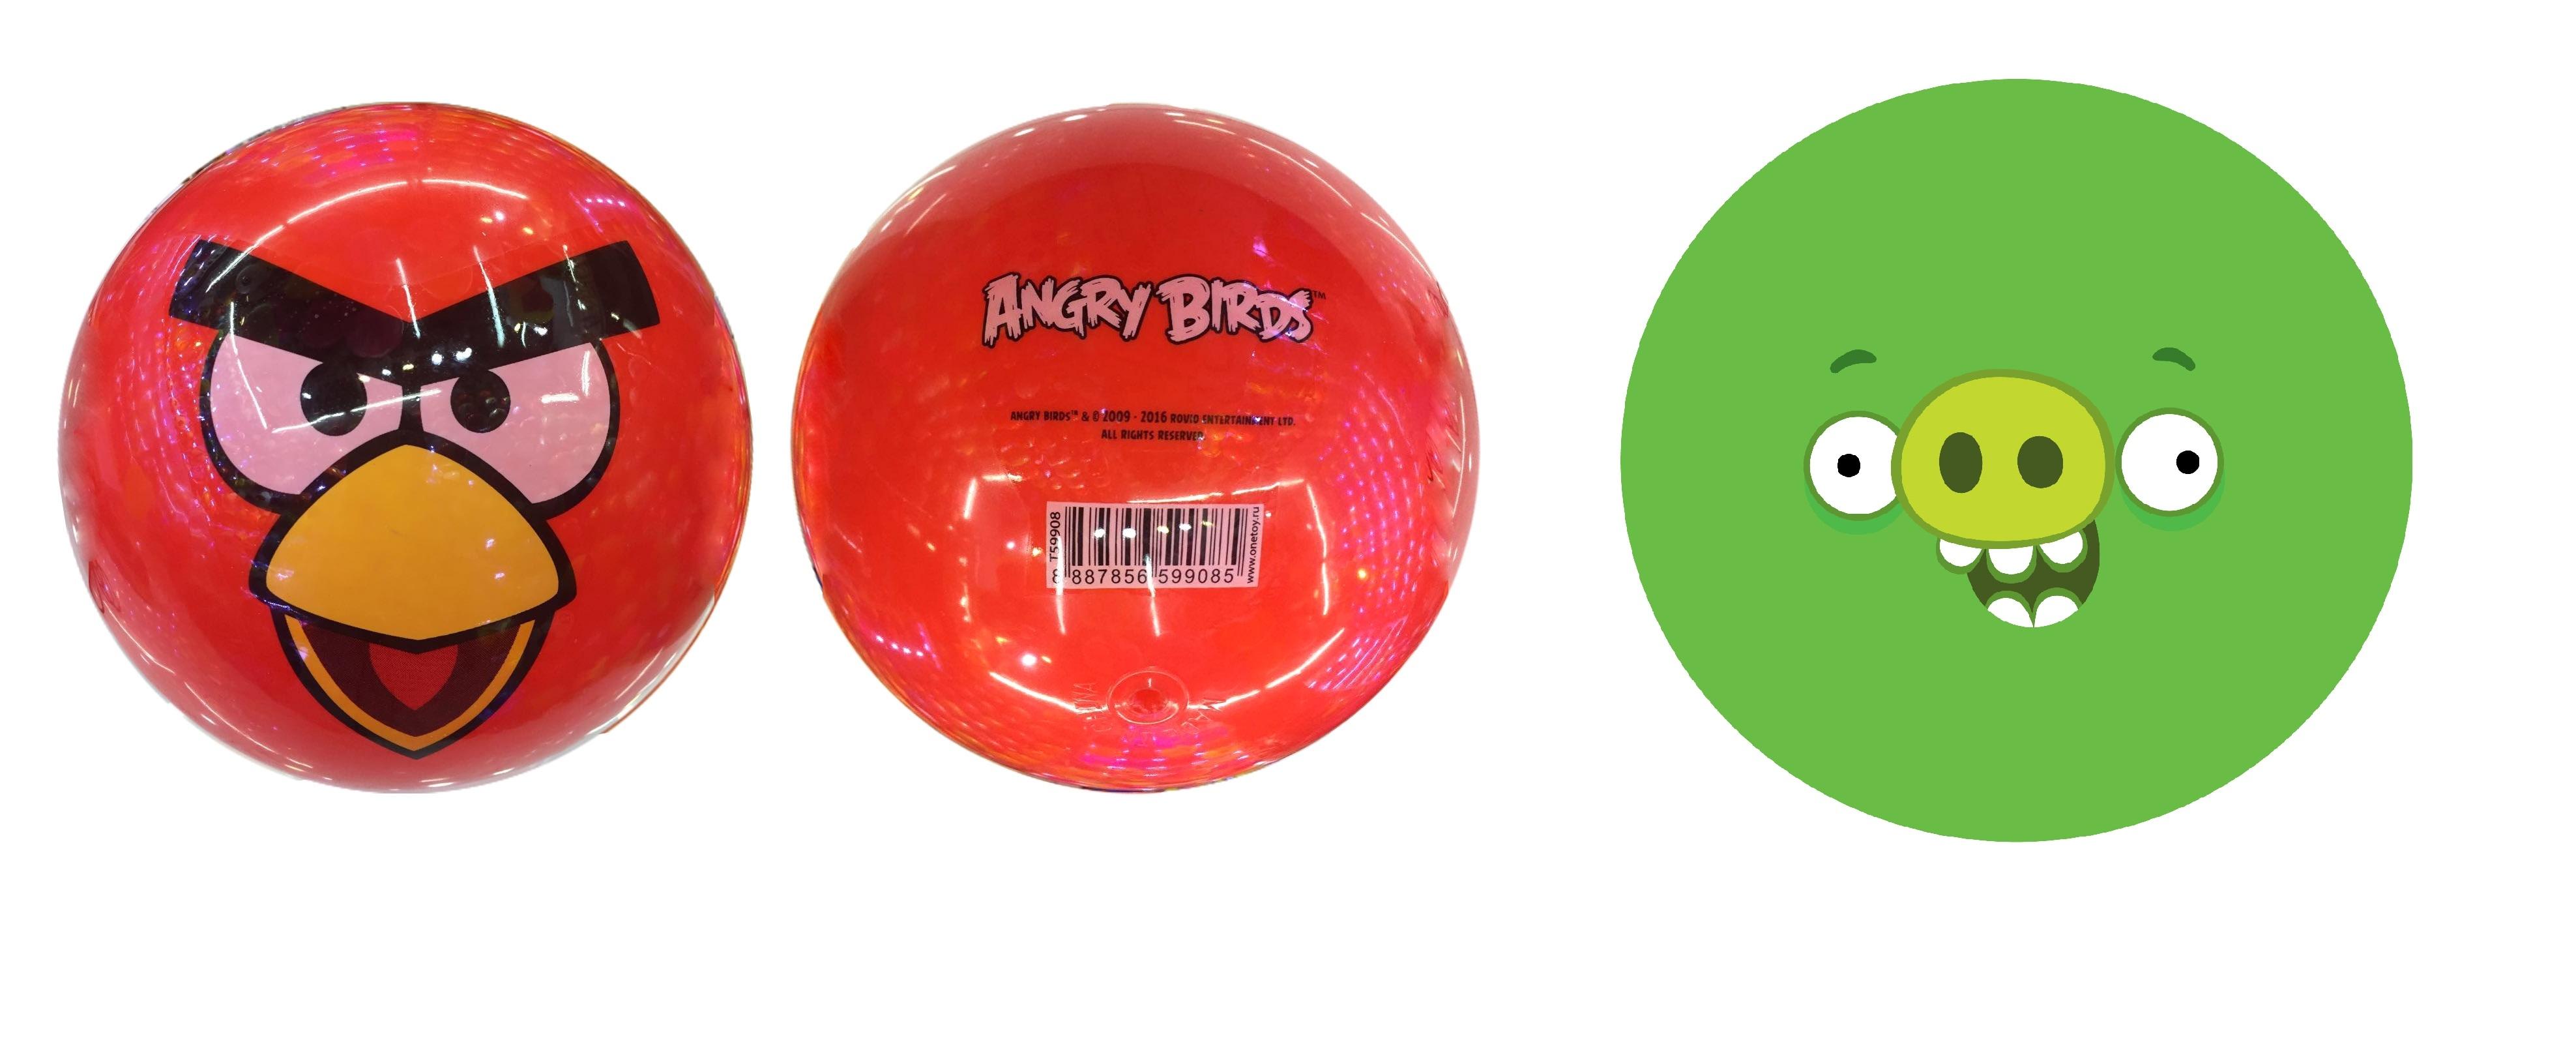 Мячи 1toy Angry Birds Т59908 шумелка angry birds с конфетами в ассортименте